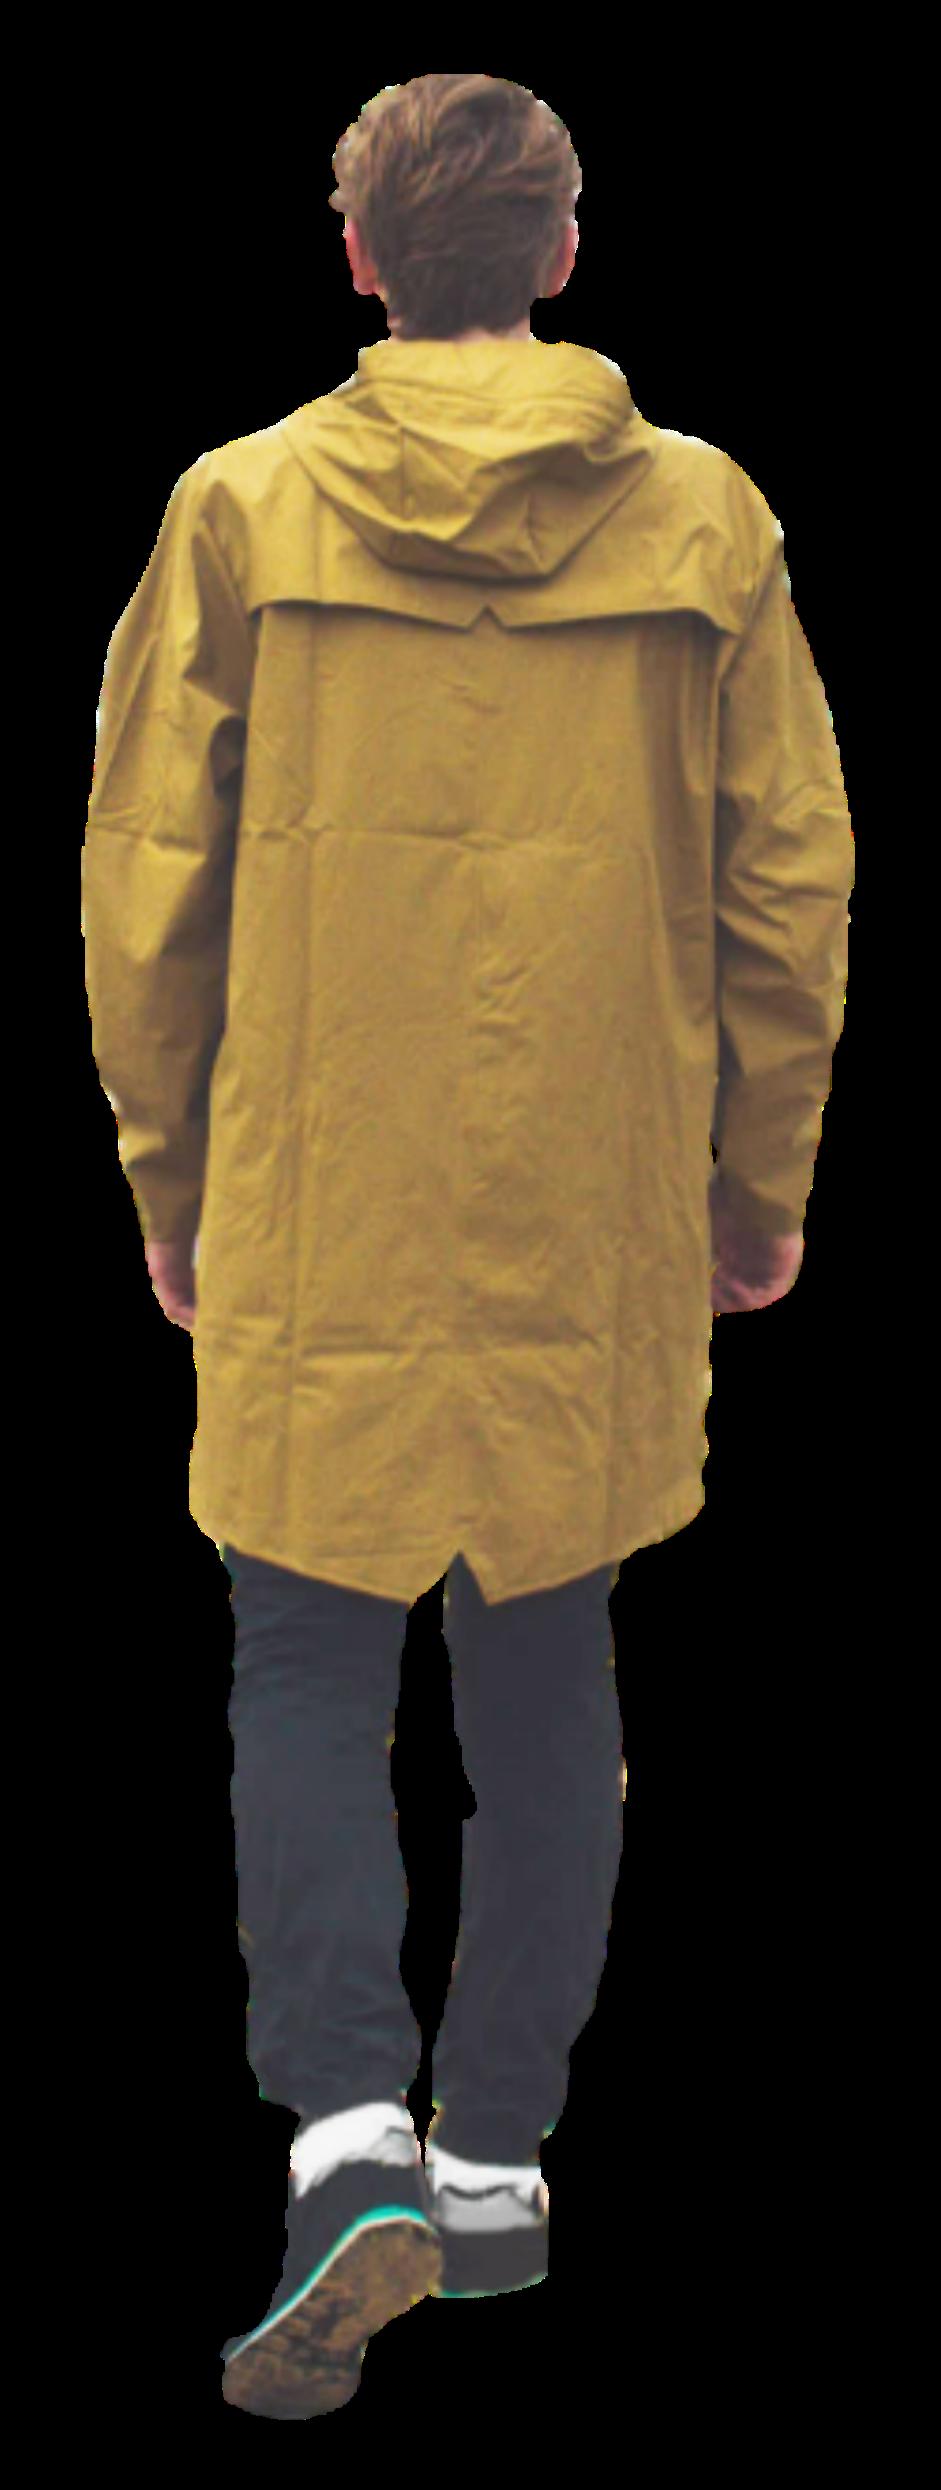 #  man #boy #yellow #raincoat #coat #walking #people